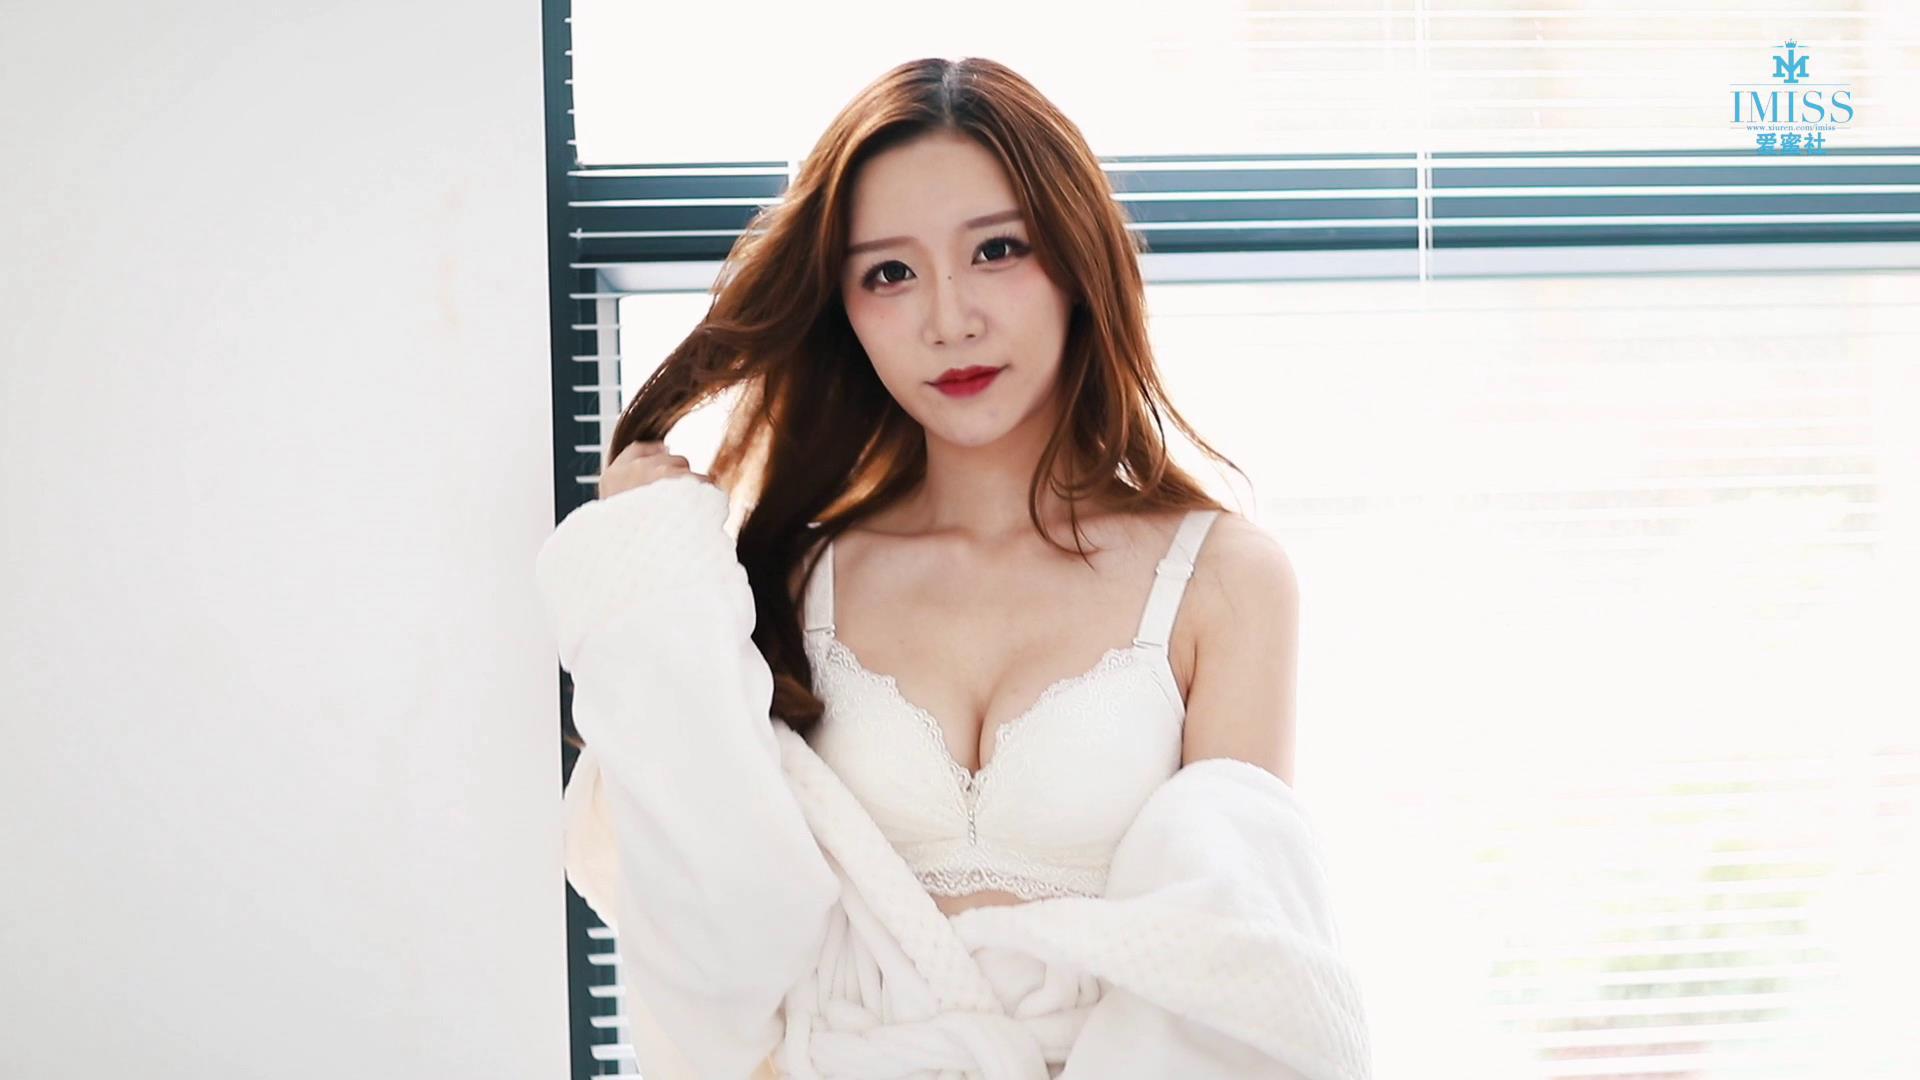 [IMiss爱蜜社]2018.05.08 VN.027 小琳[1V/213MB]